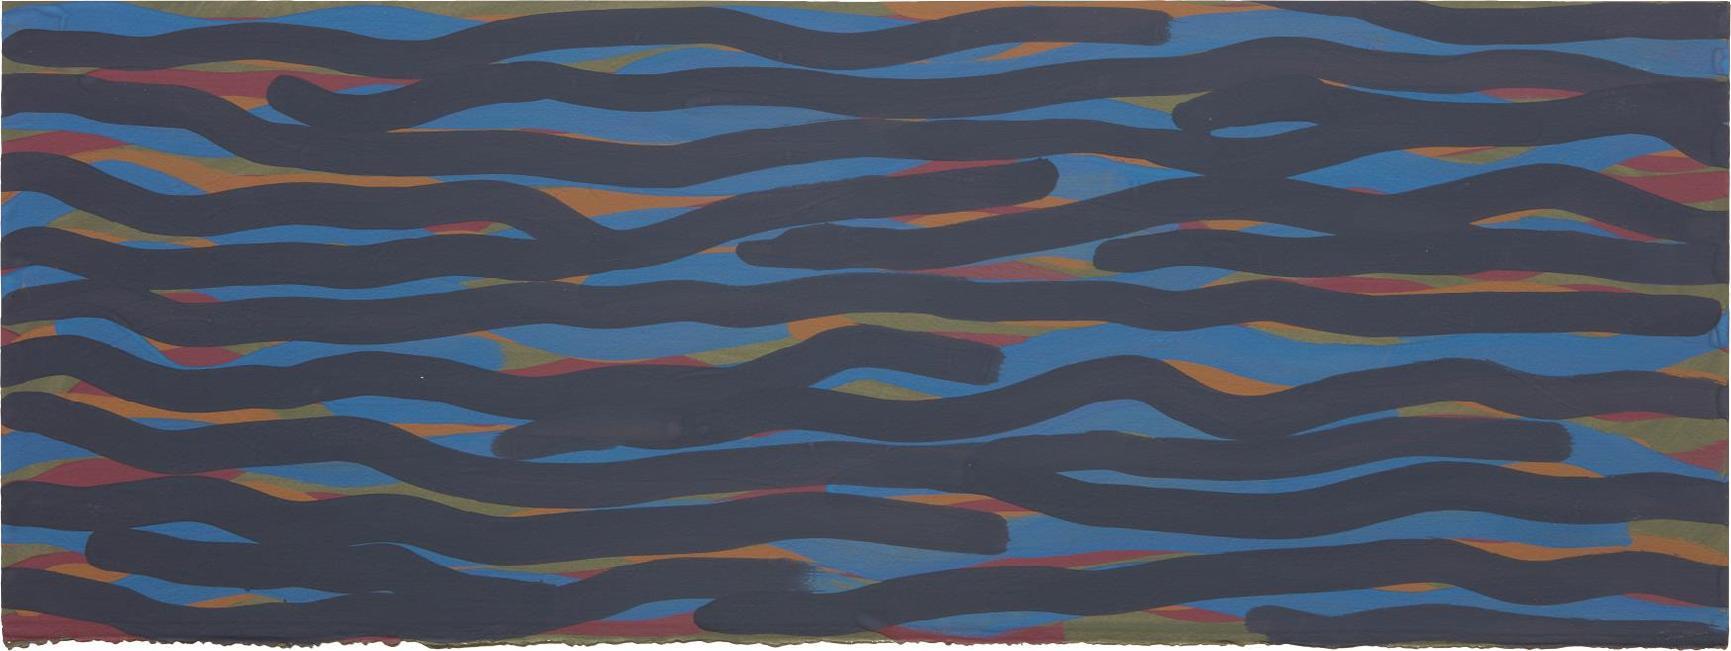 Sol LeWitt-Wavy Brushstrokes (Blue, Gold, Red, Green)-2004